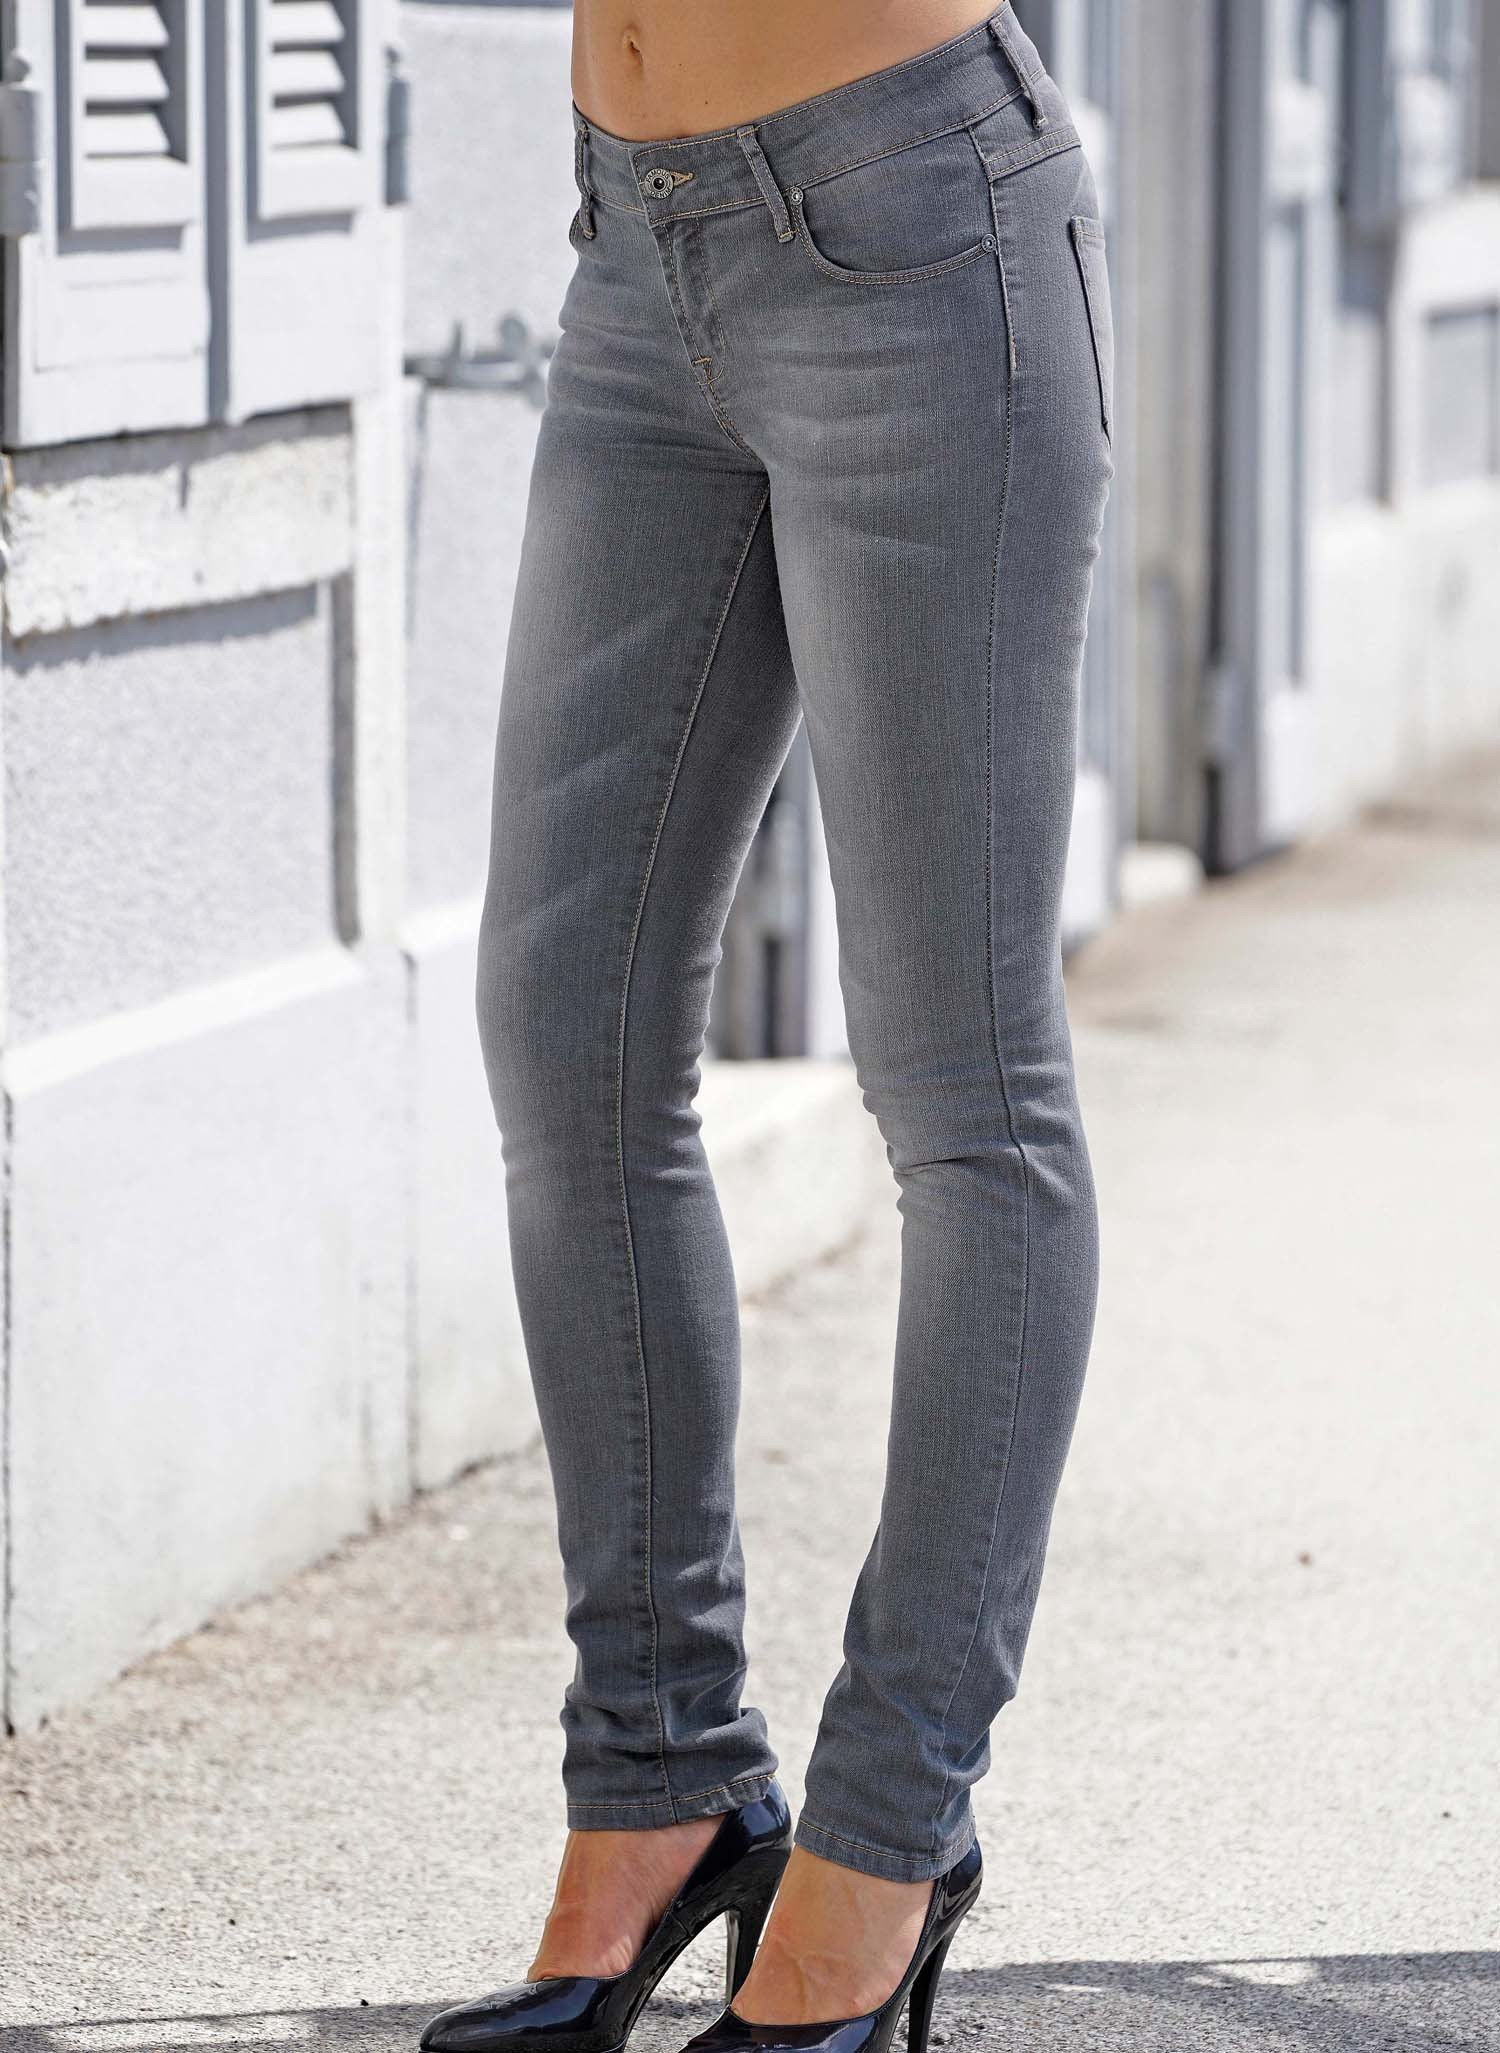 D-5P-Jeans, Grey-Denim 44 005 - 2 - Ronja.ch